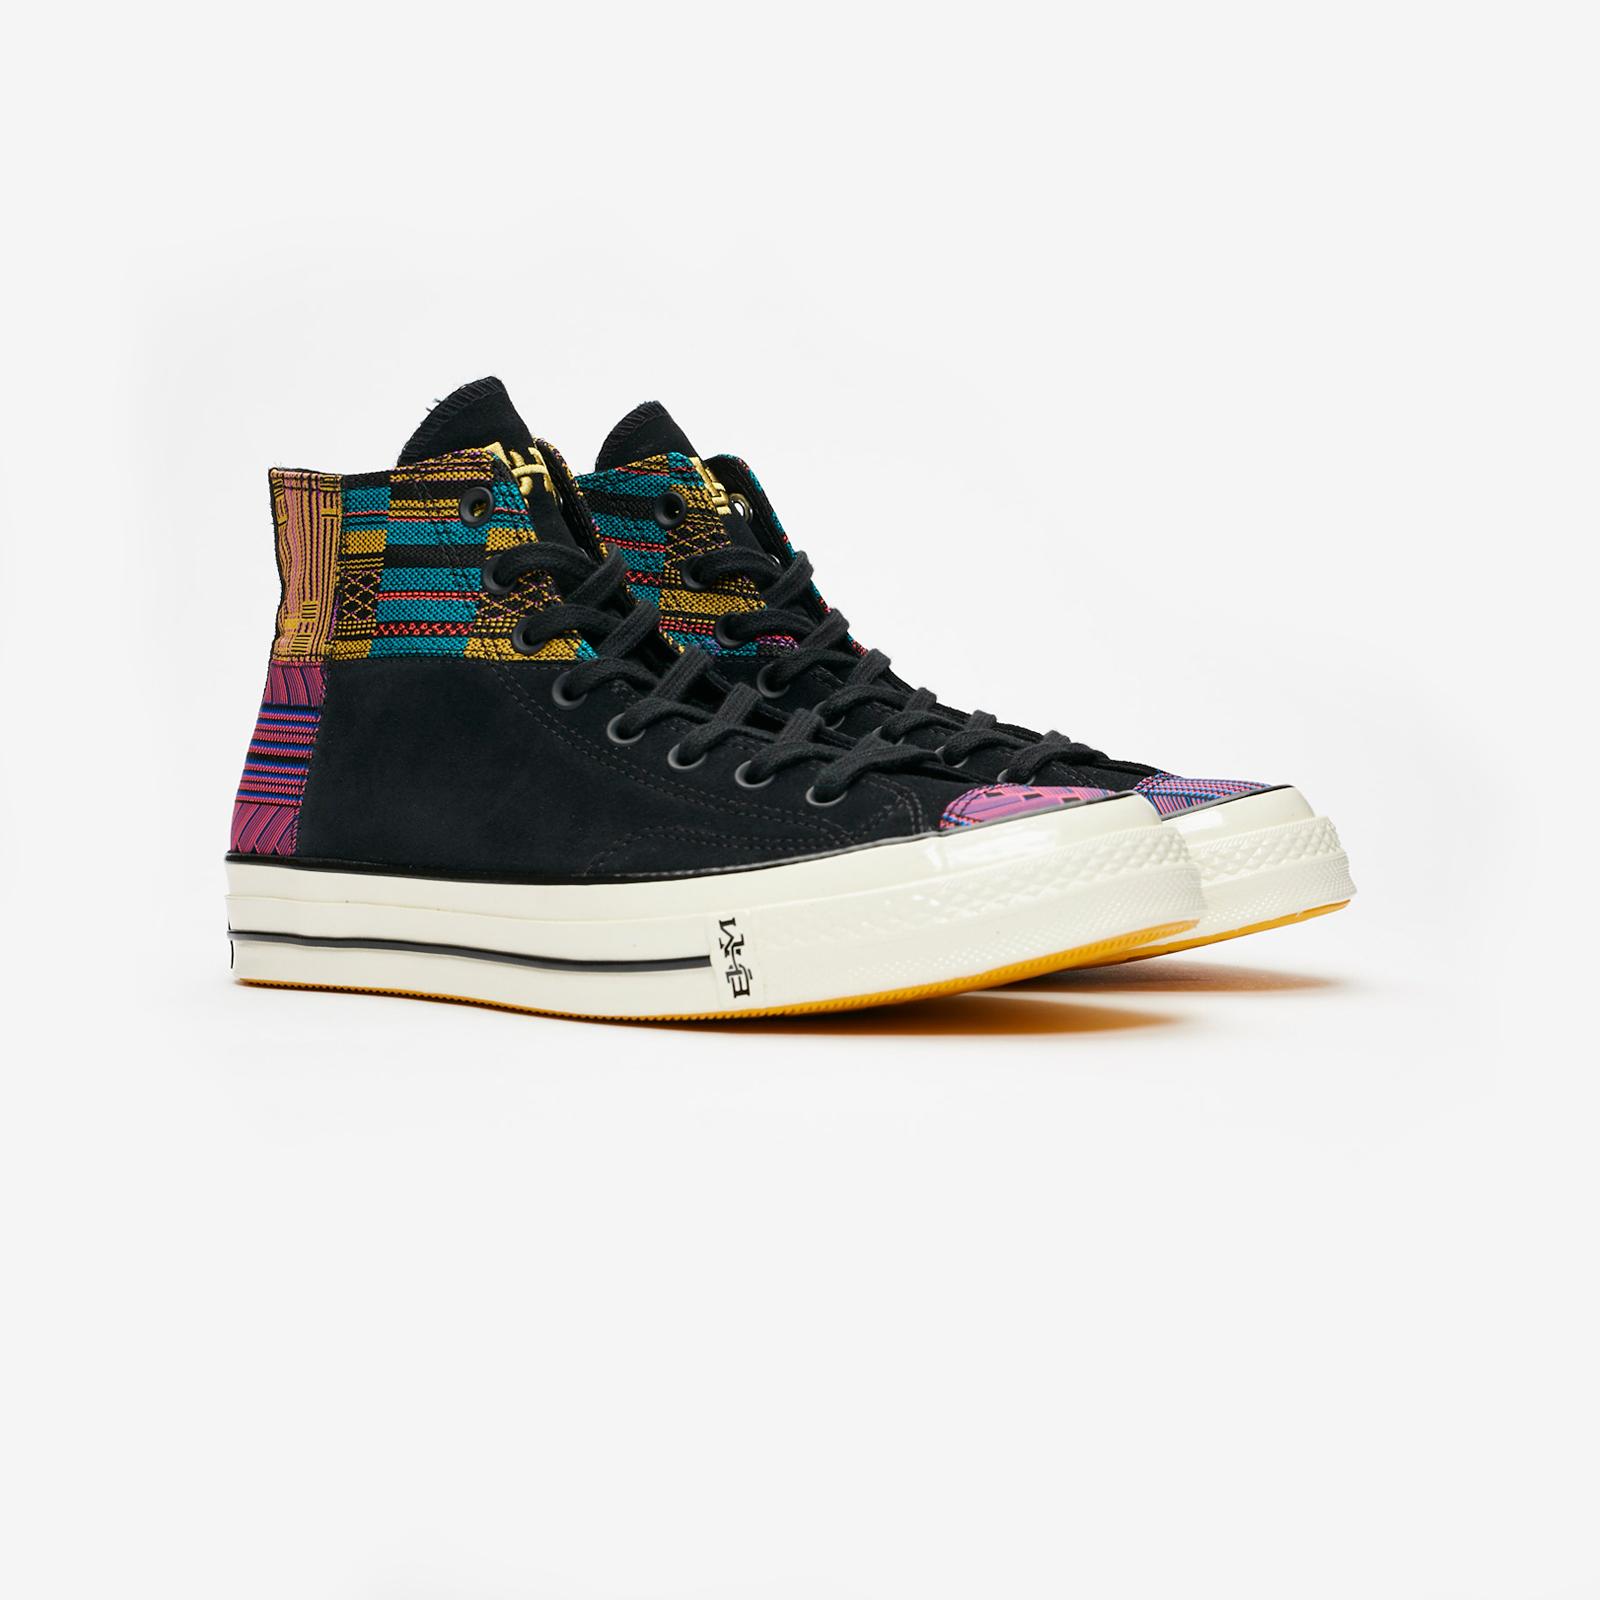 e2ae099b3fa Converse Chuck 70s Hi - 165556c - Sneakersnstuff I Sneakers ...